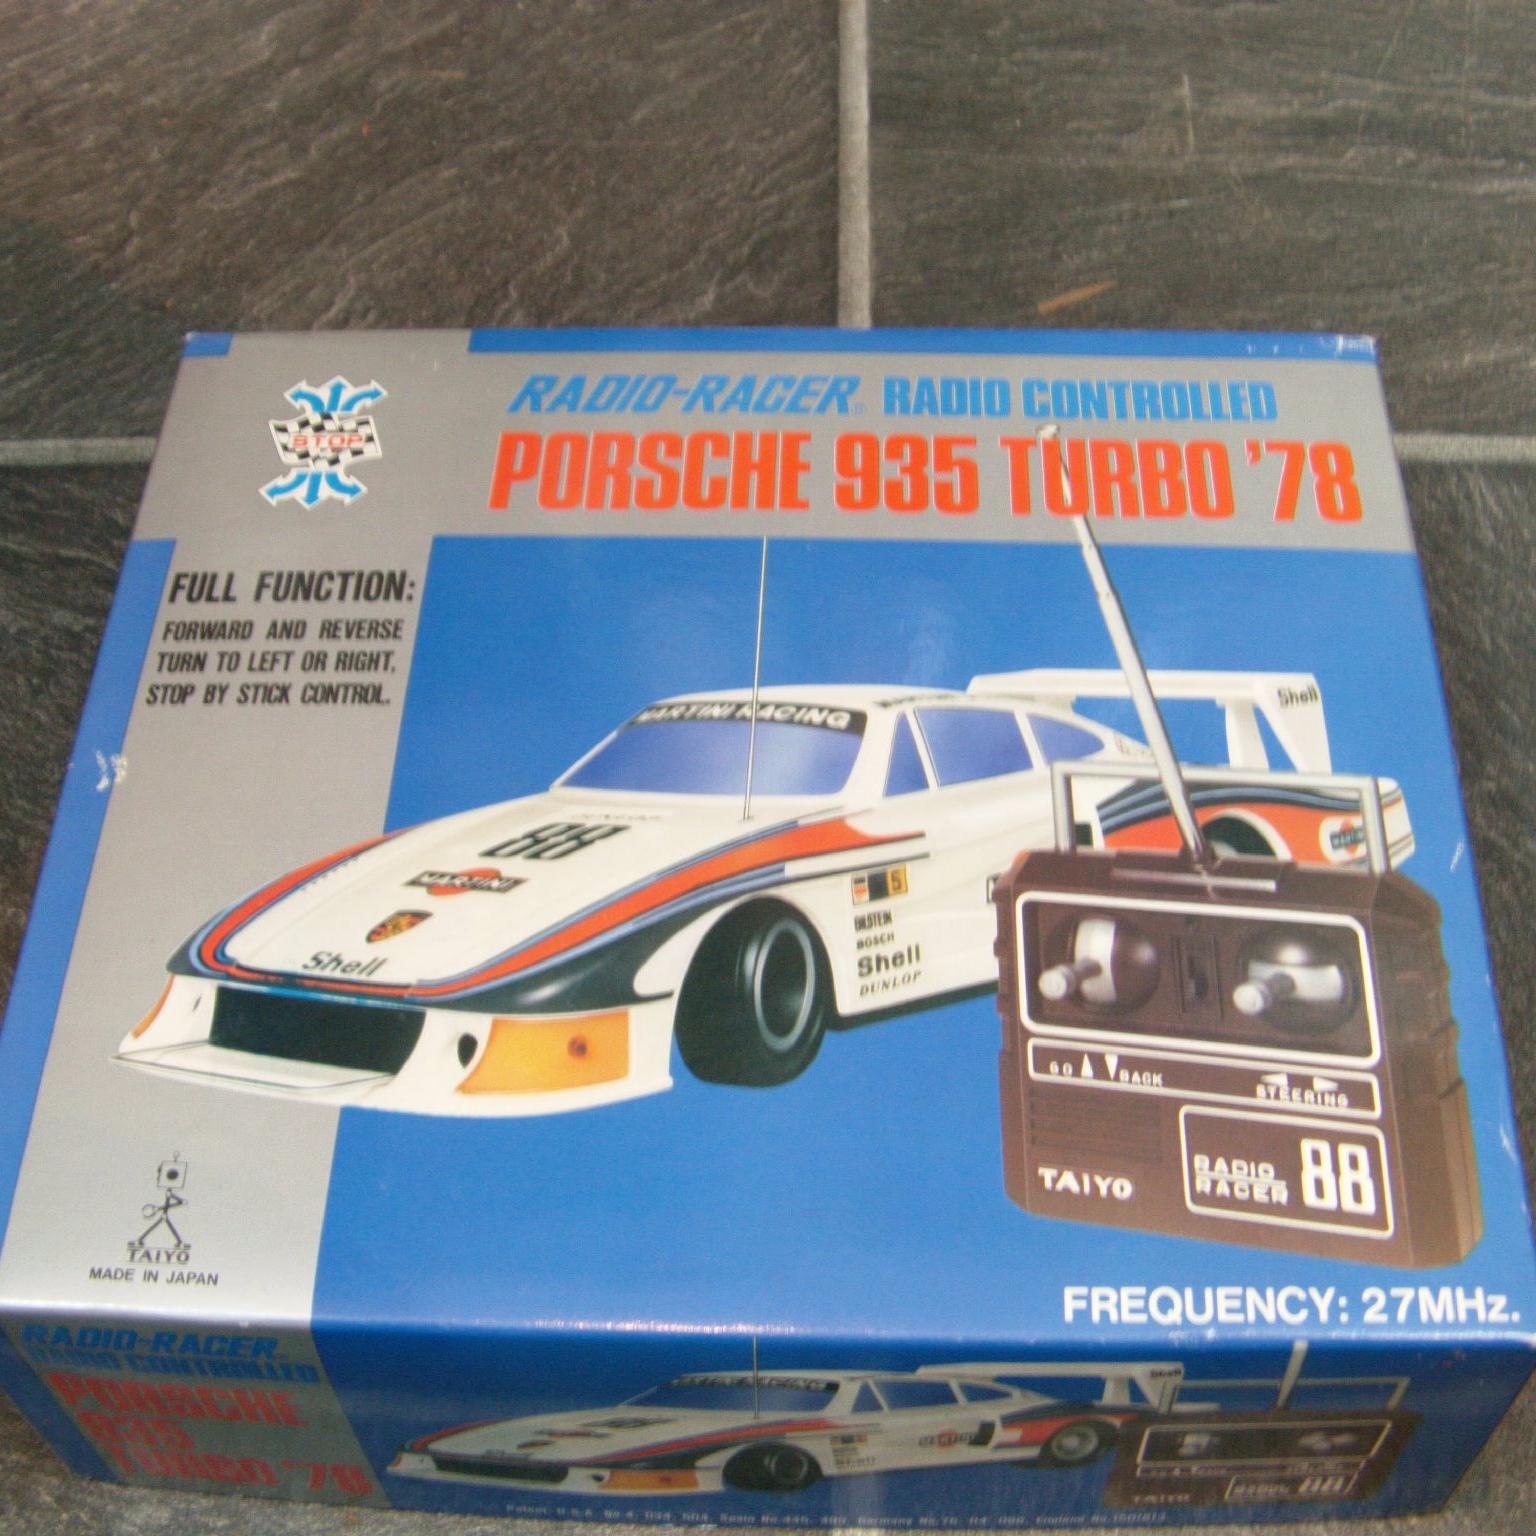 ITEM Retro late 70 s early 80 s Porsche 935 martini racing